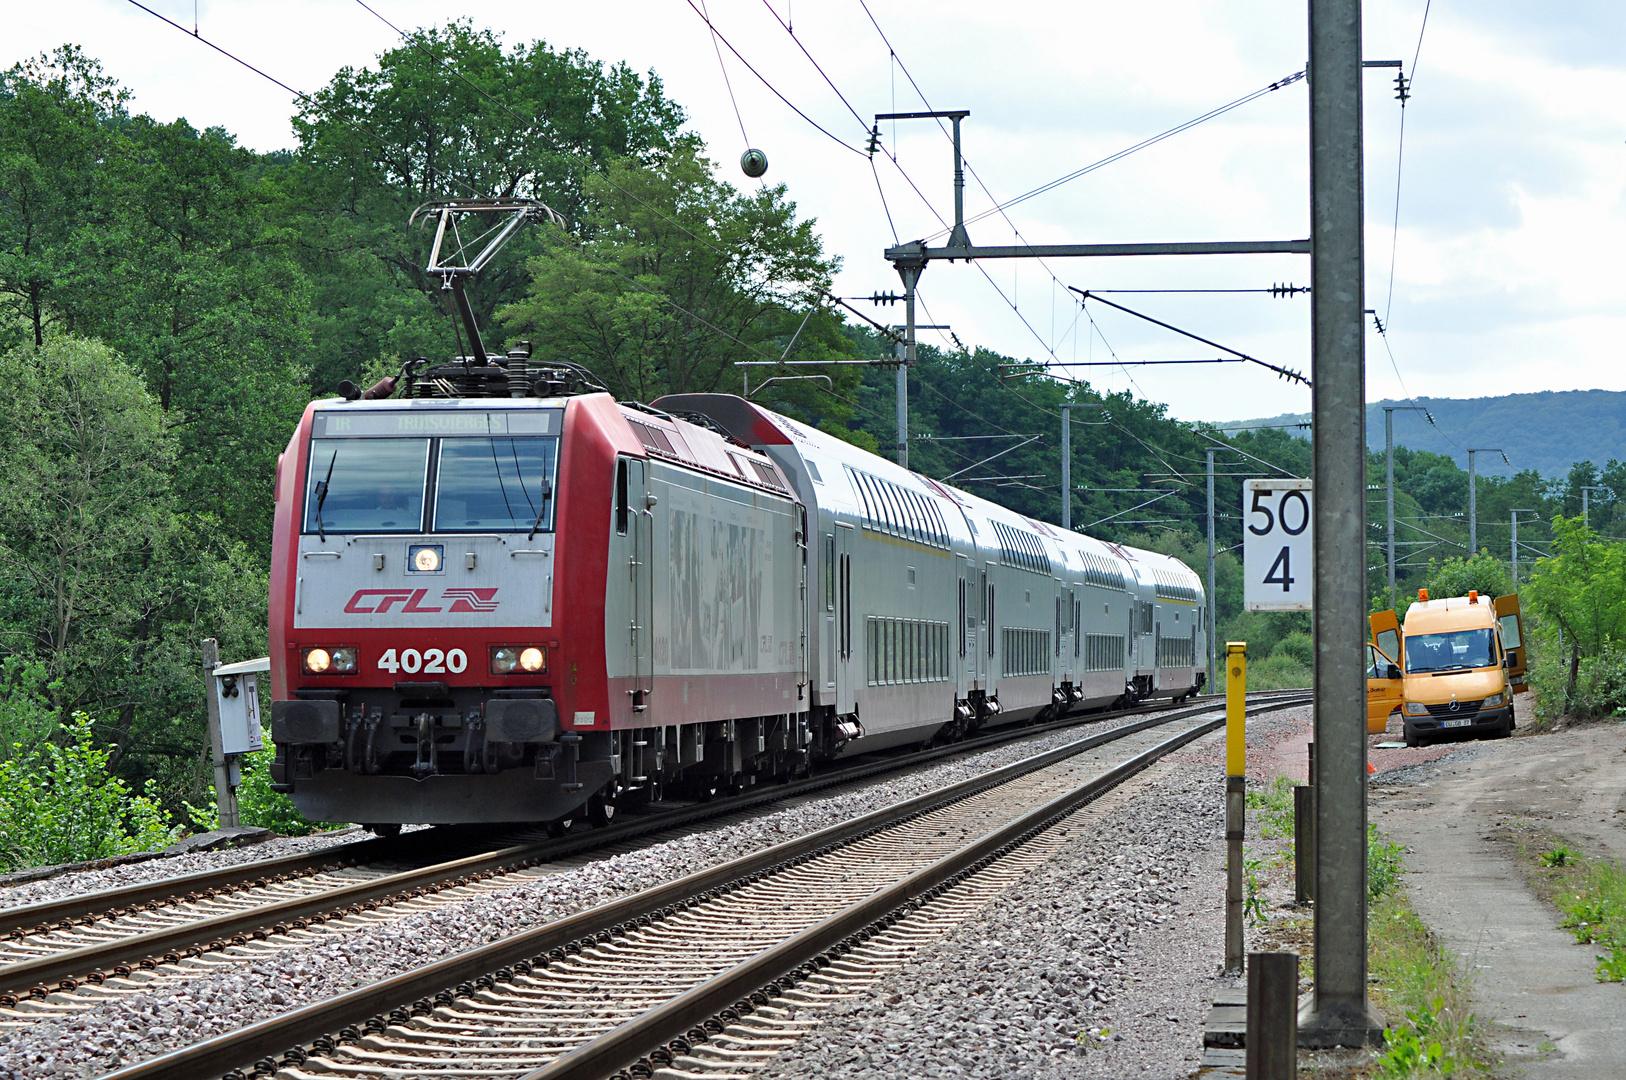 CFL 4020